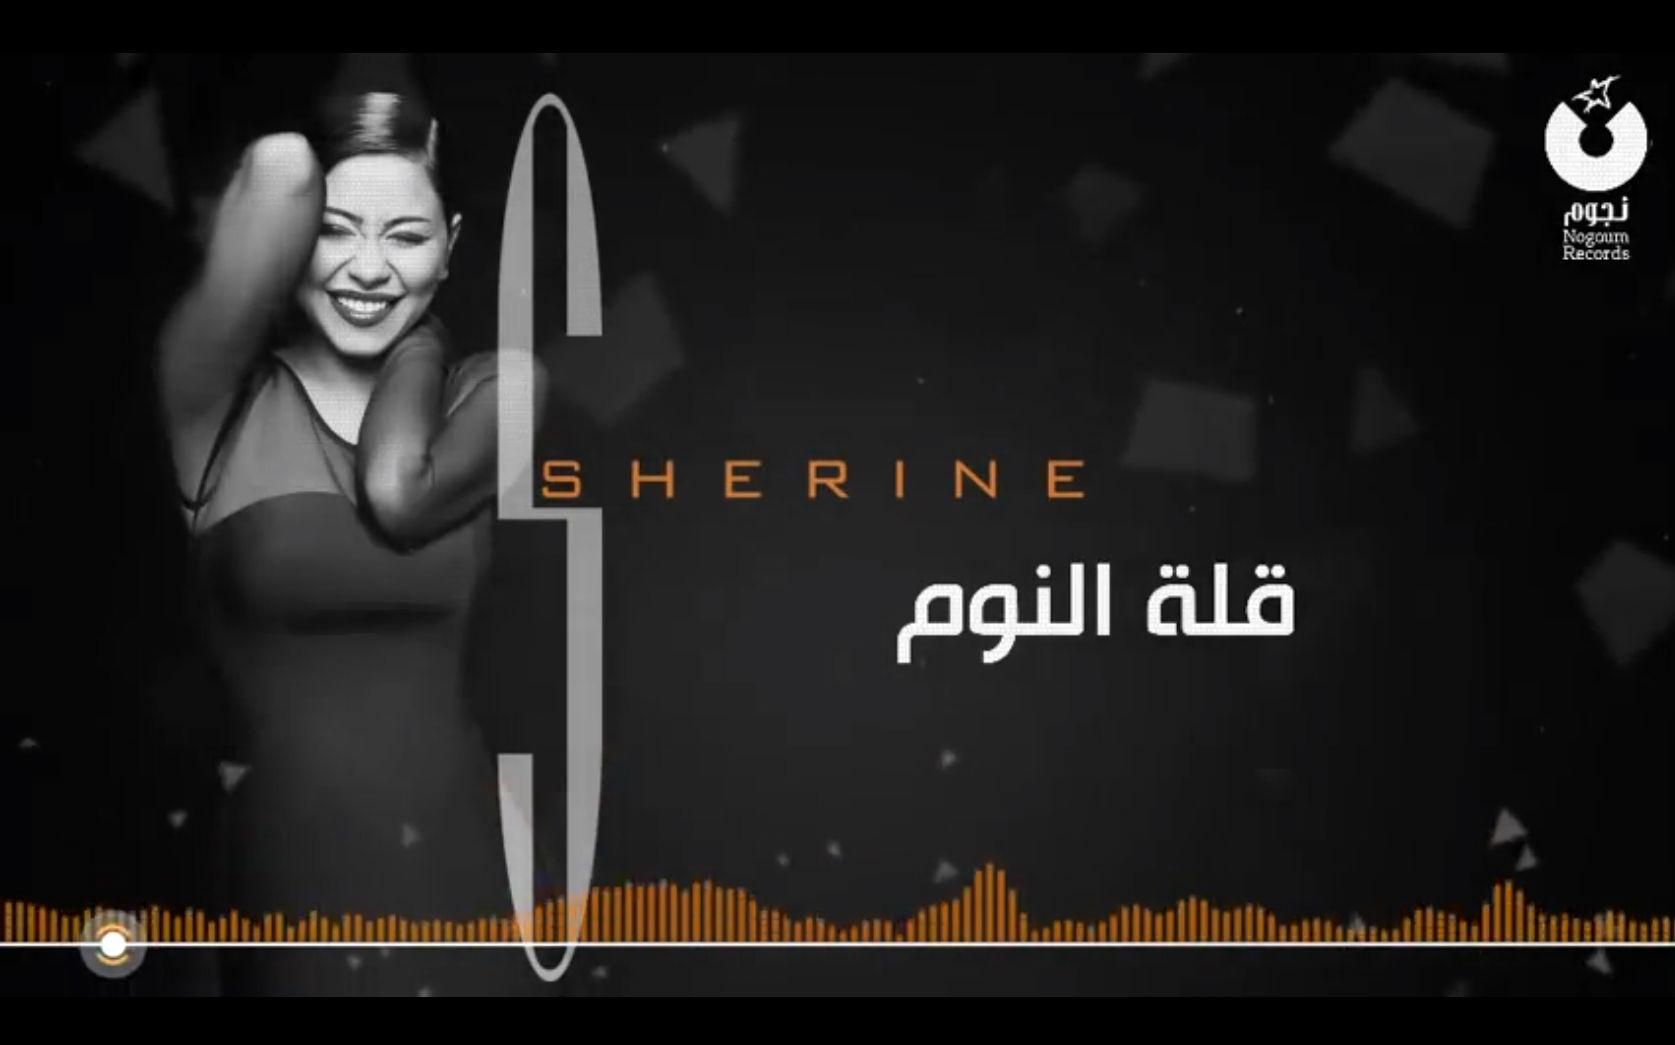 Sabri Aleel Lyrics Translation in English, Sung by Shereen